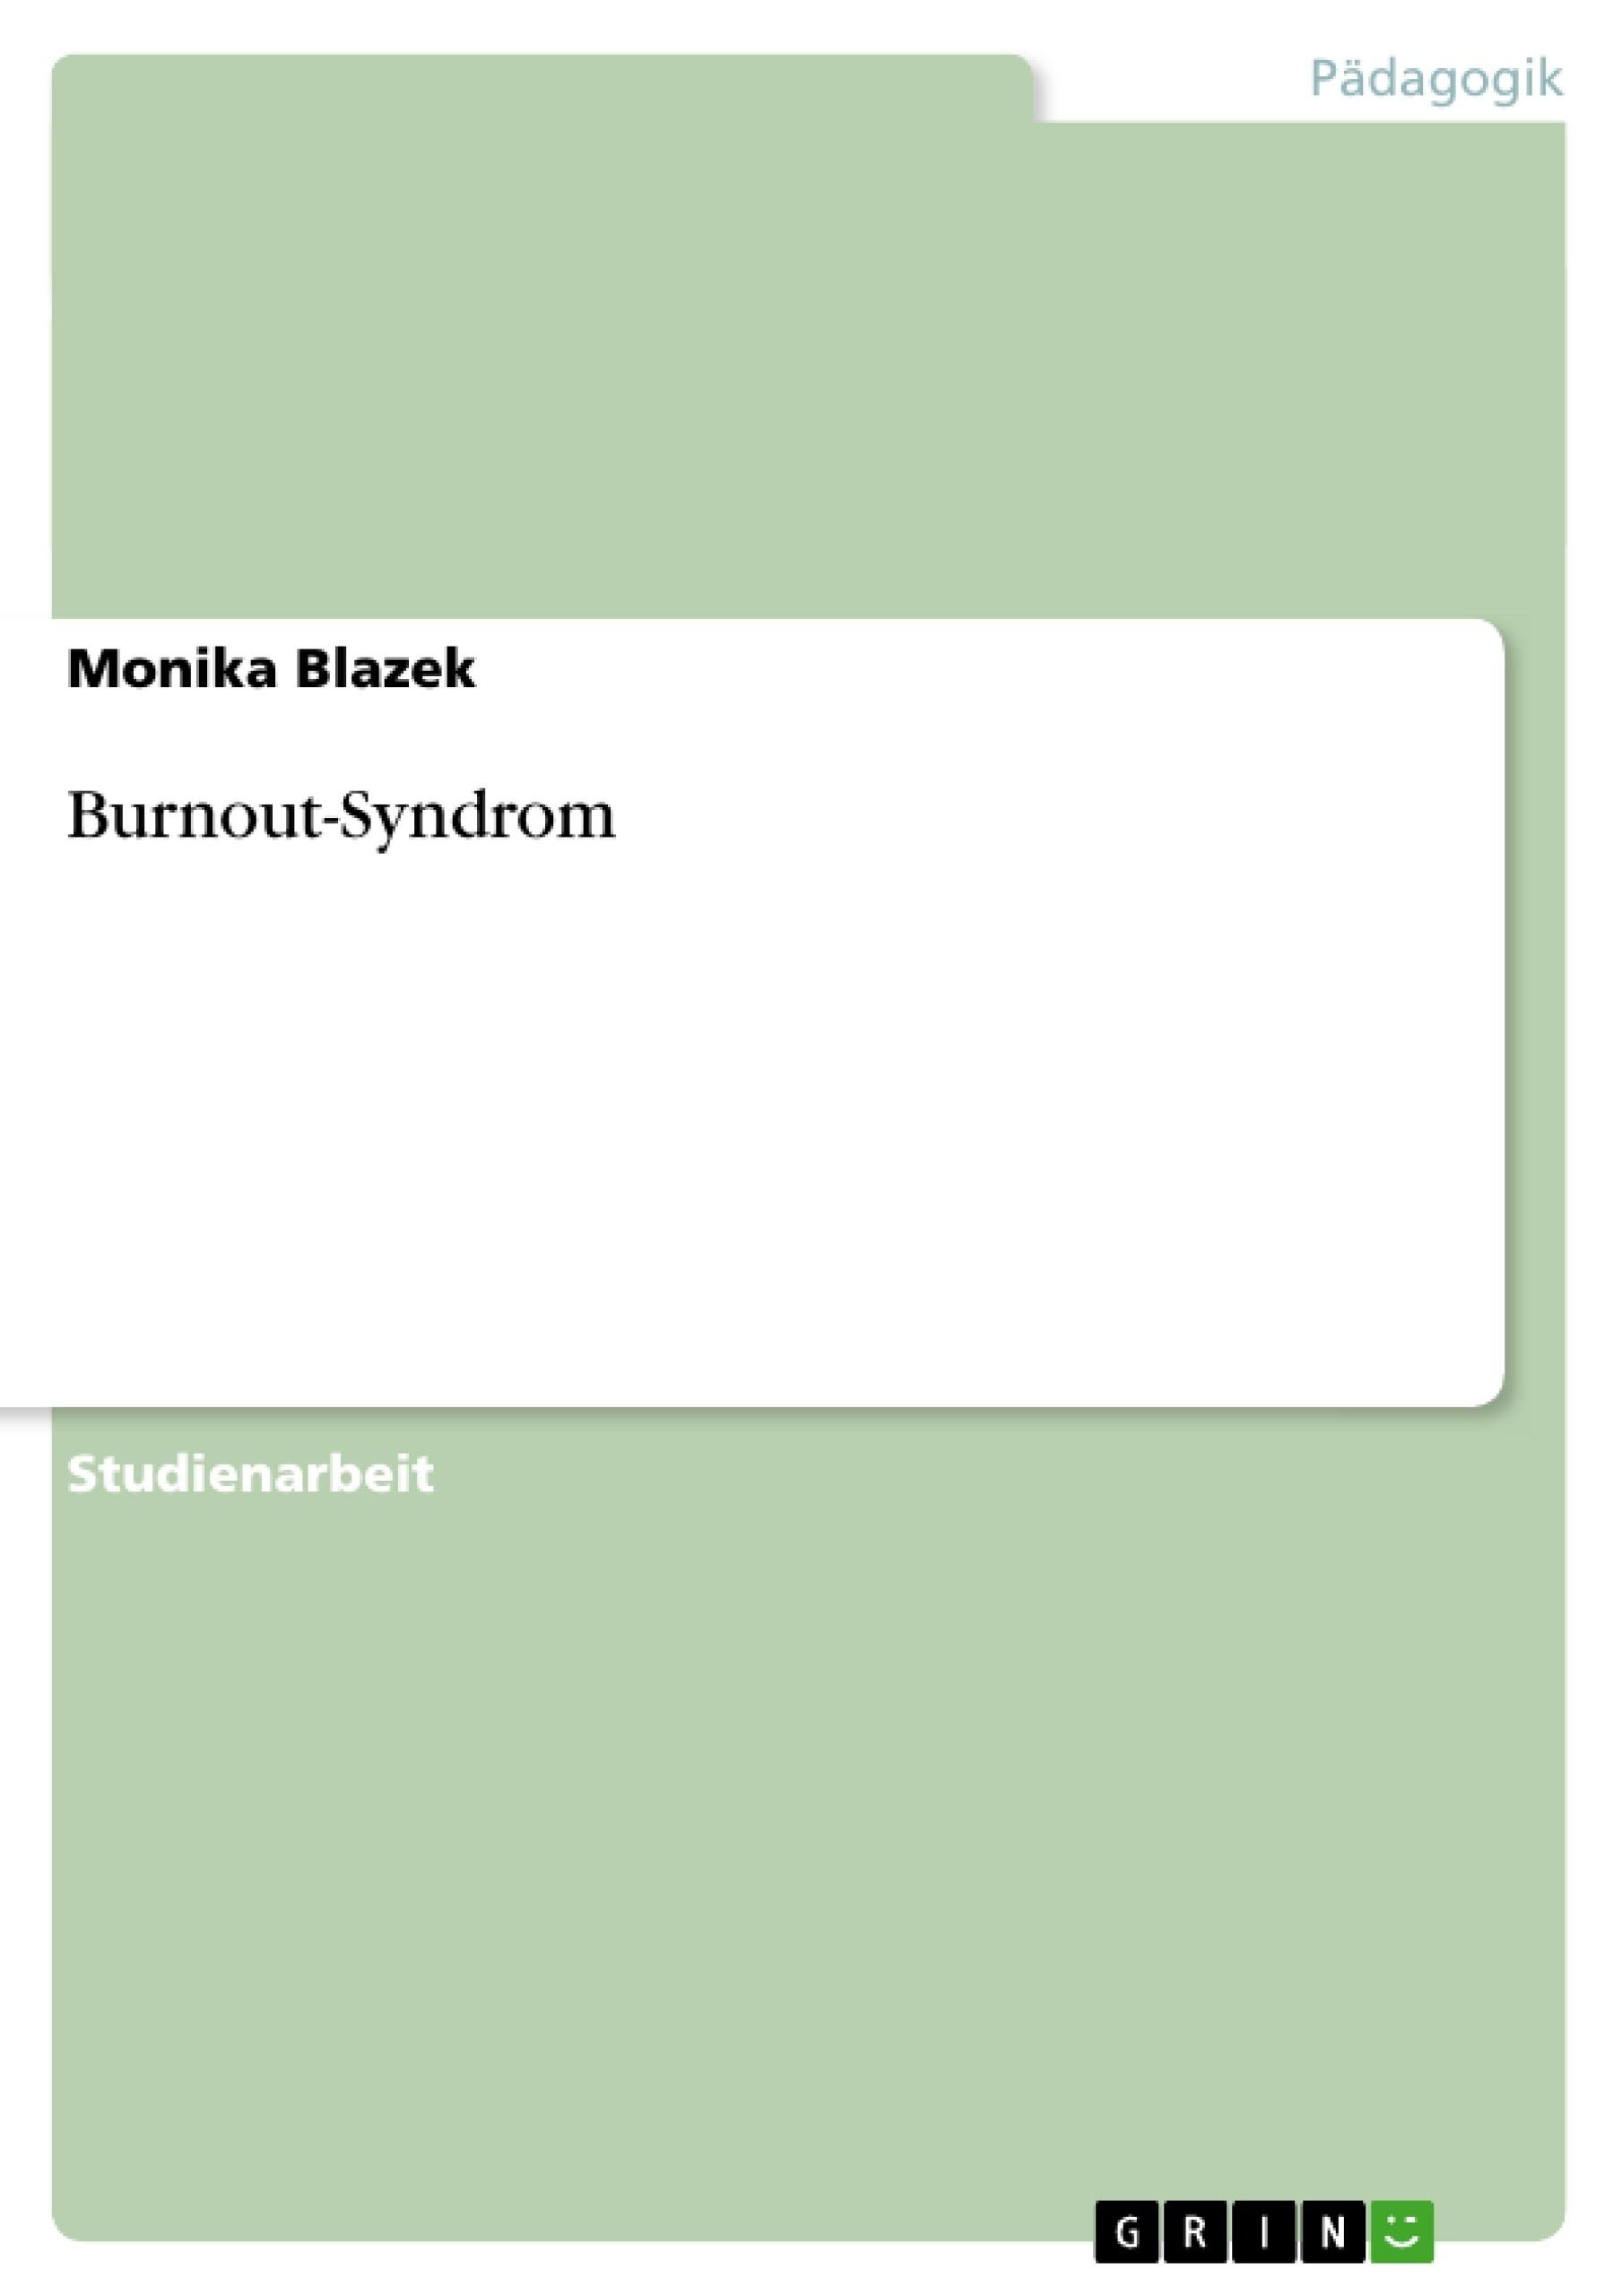 Titel: Burnout-Syndrom